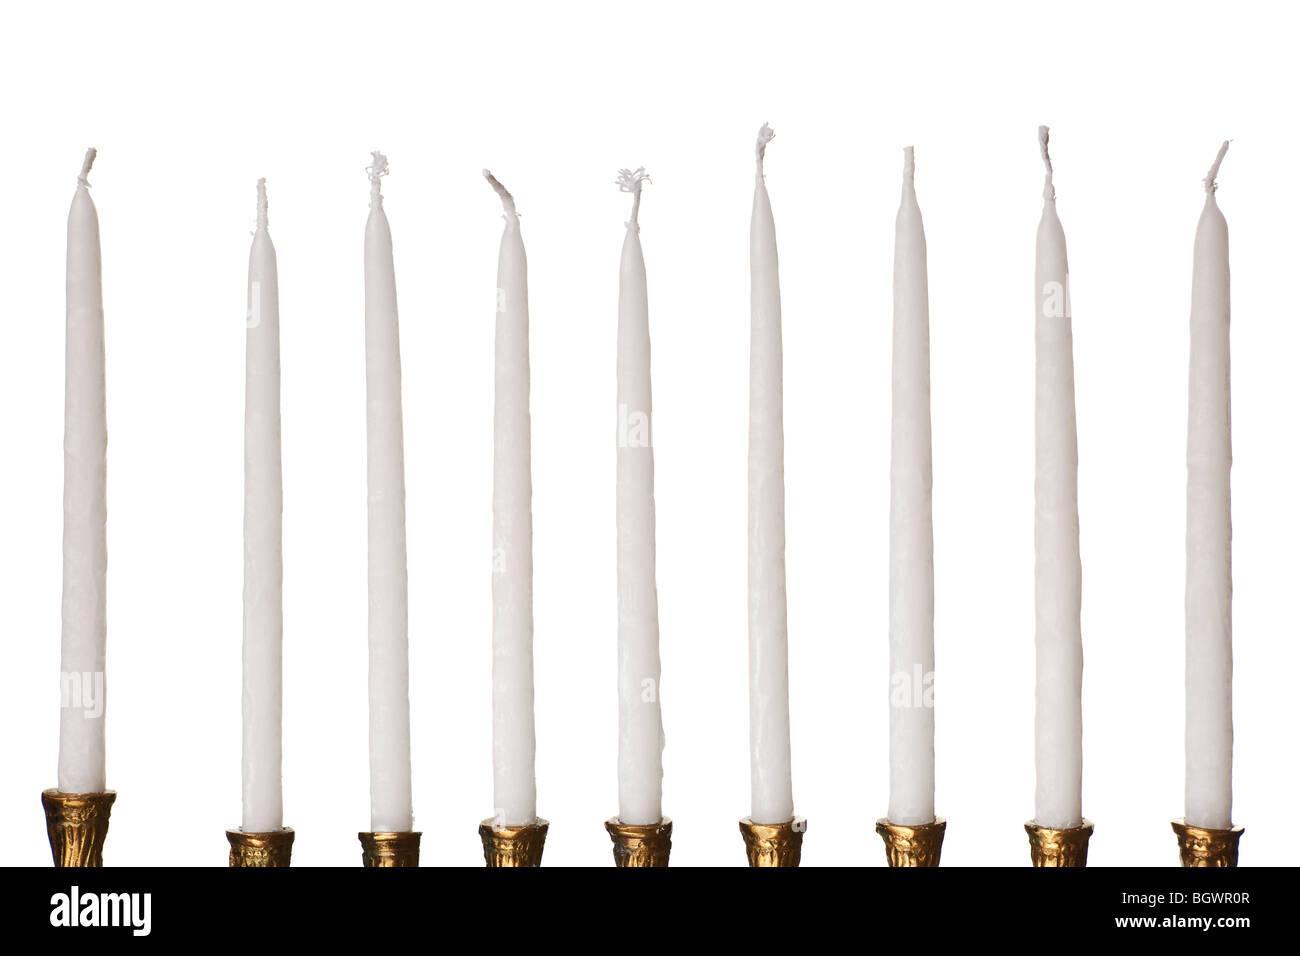 Hanukkah menorah candles isolated on a white background - Stock Image